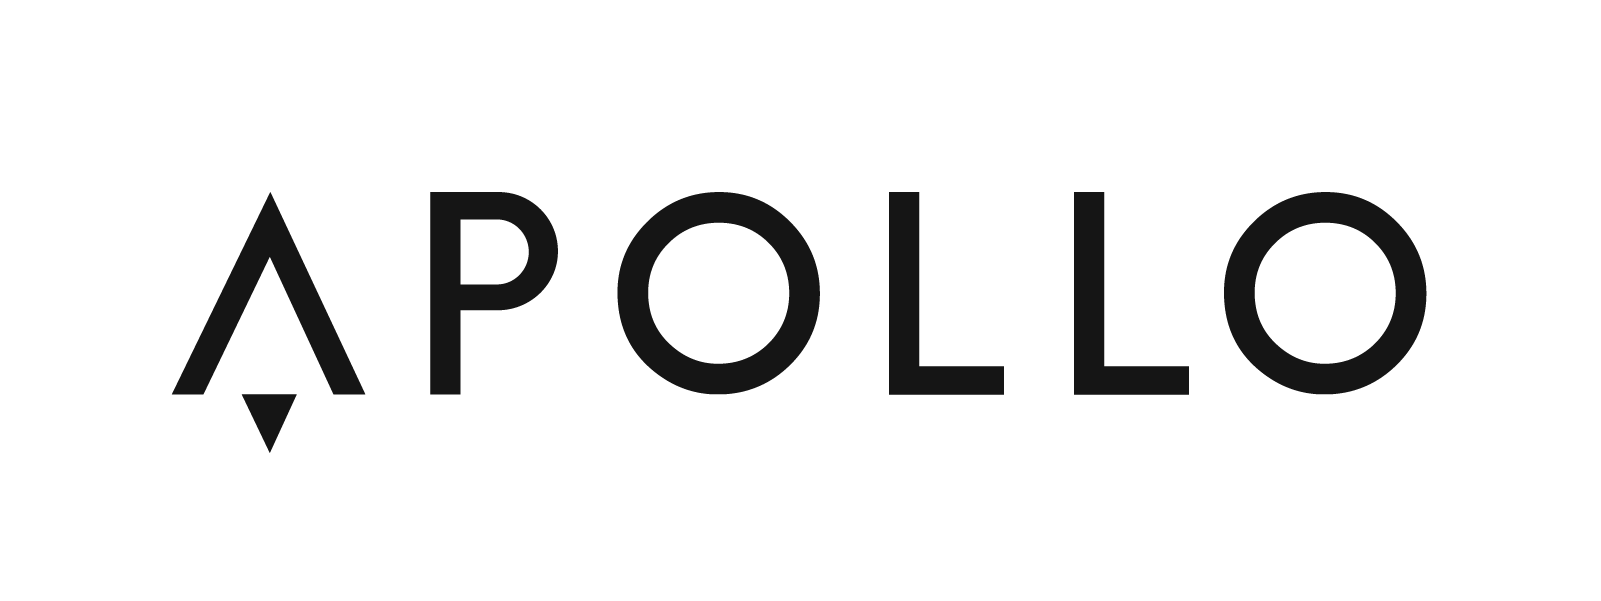 Apollo logo.